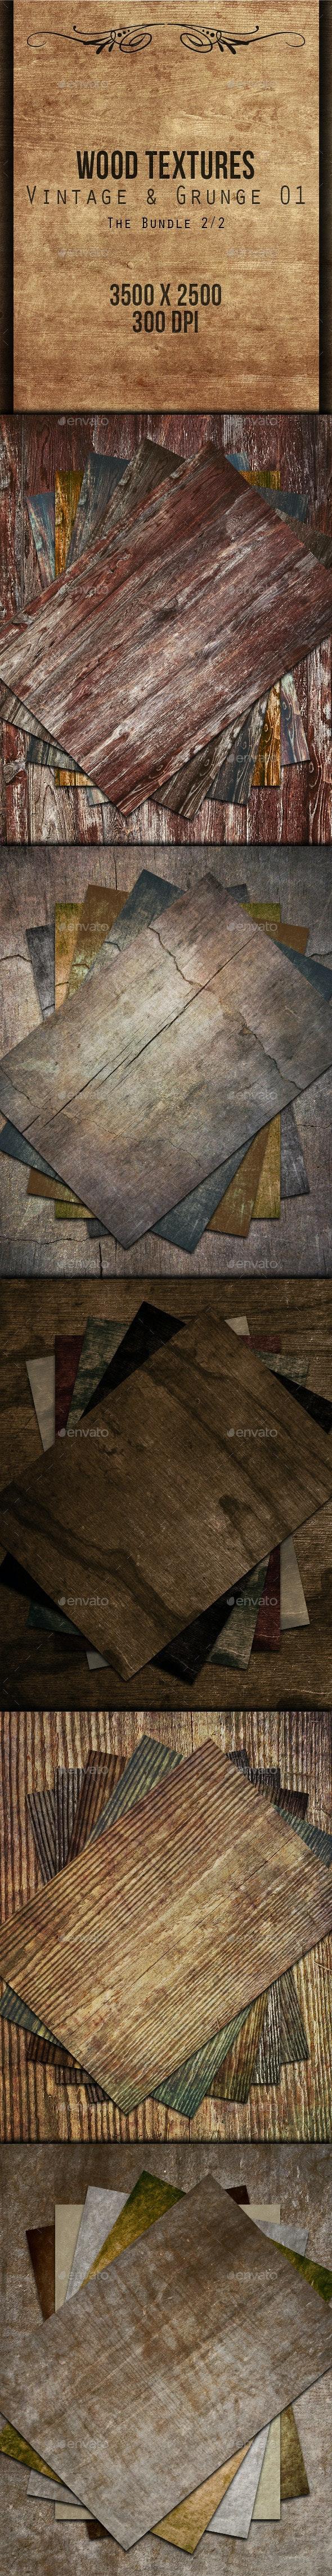 Wood Textures Bundle - Vintage & Grunge 02 - Wood Textures